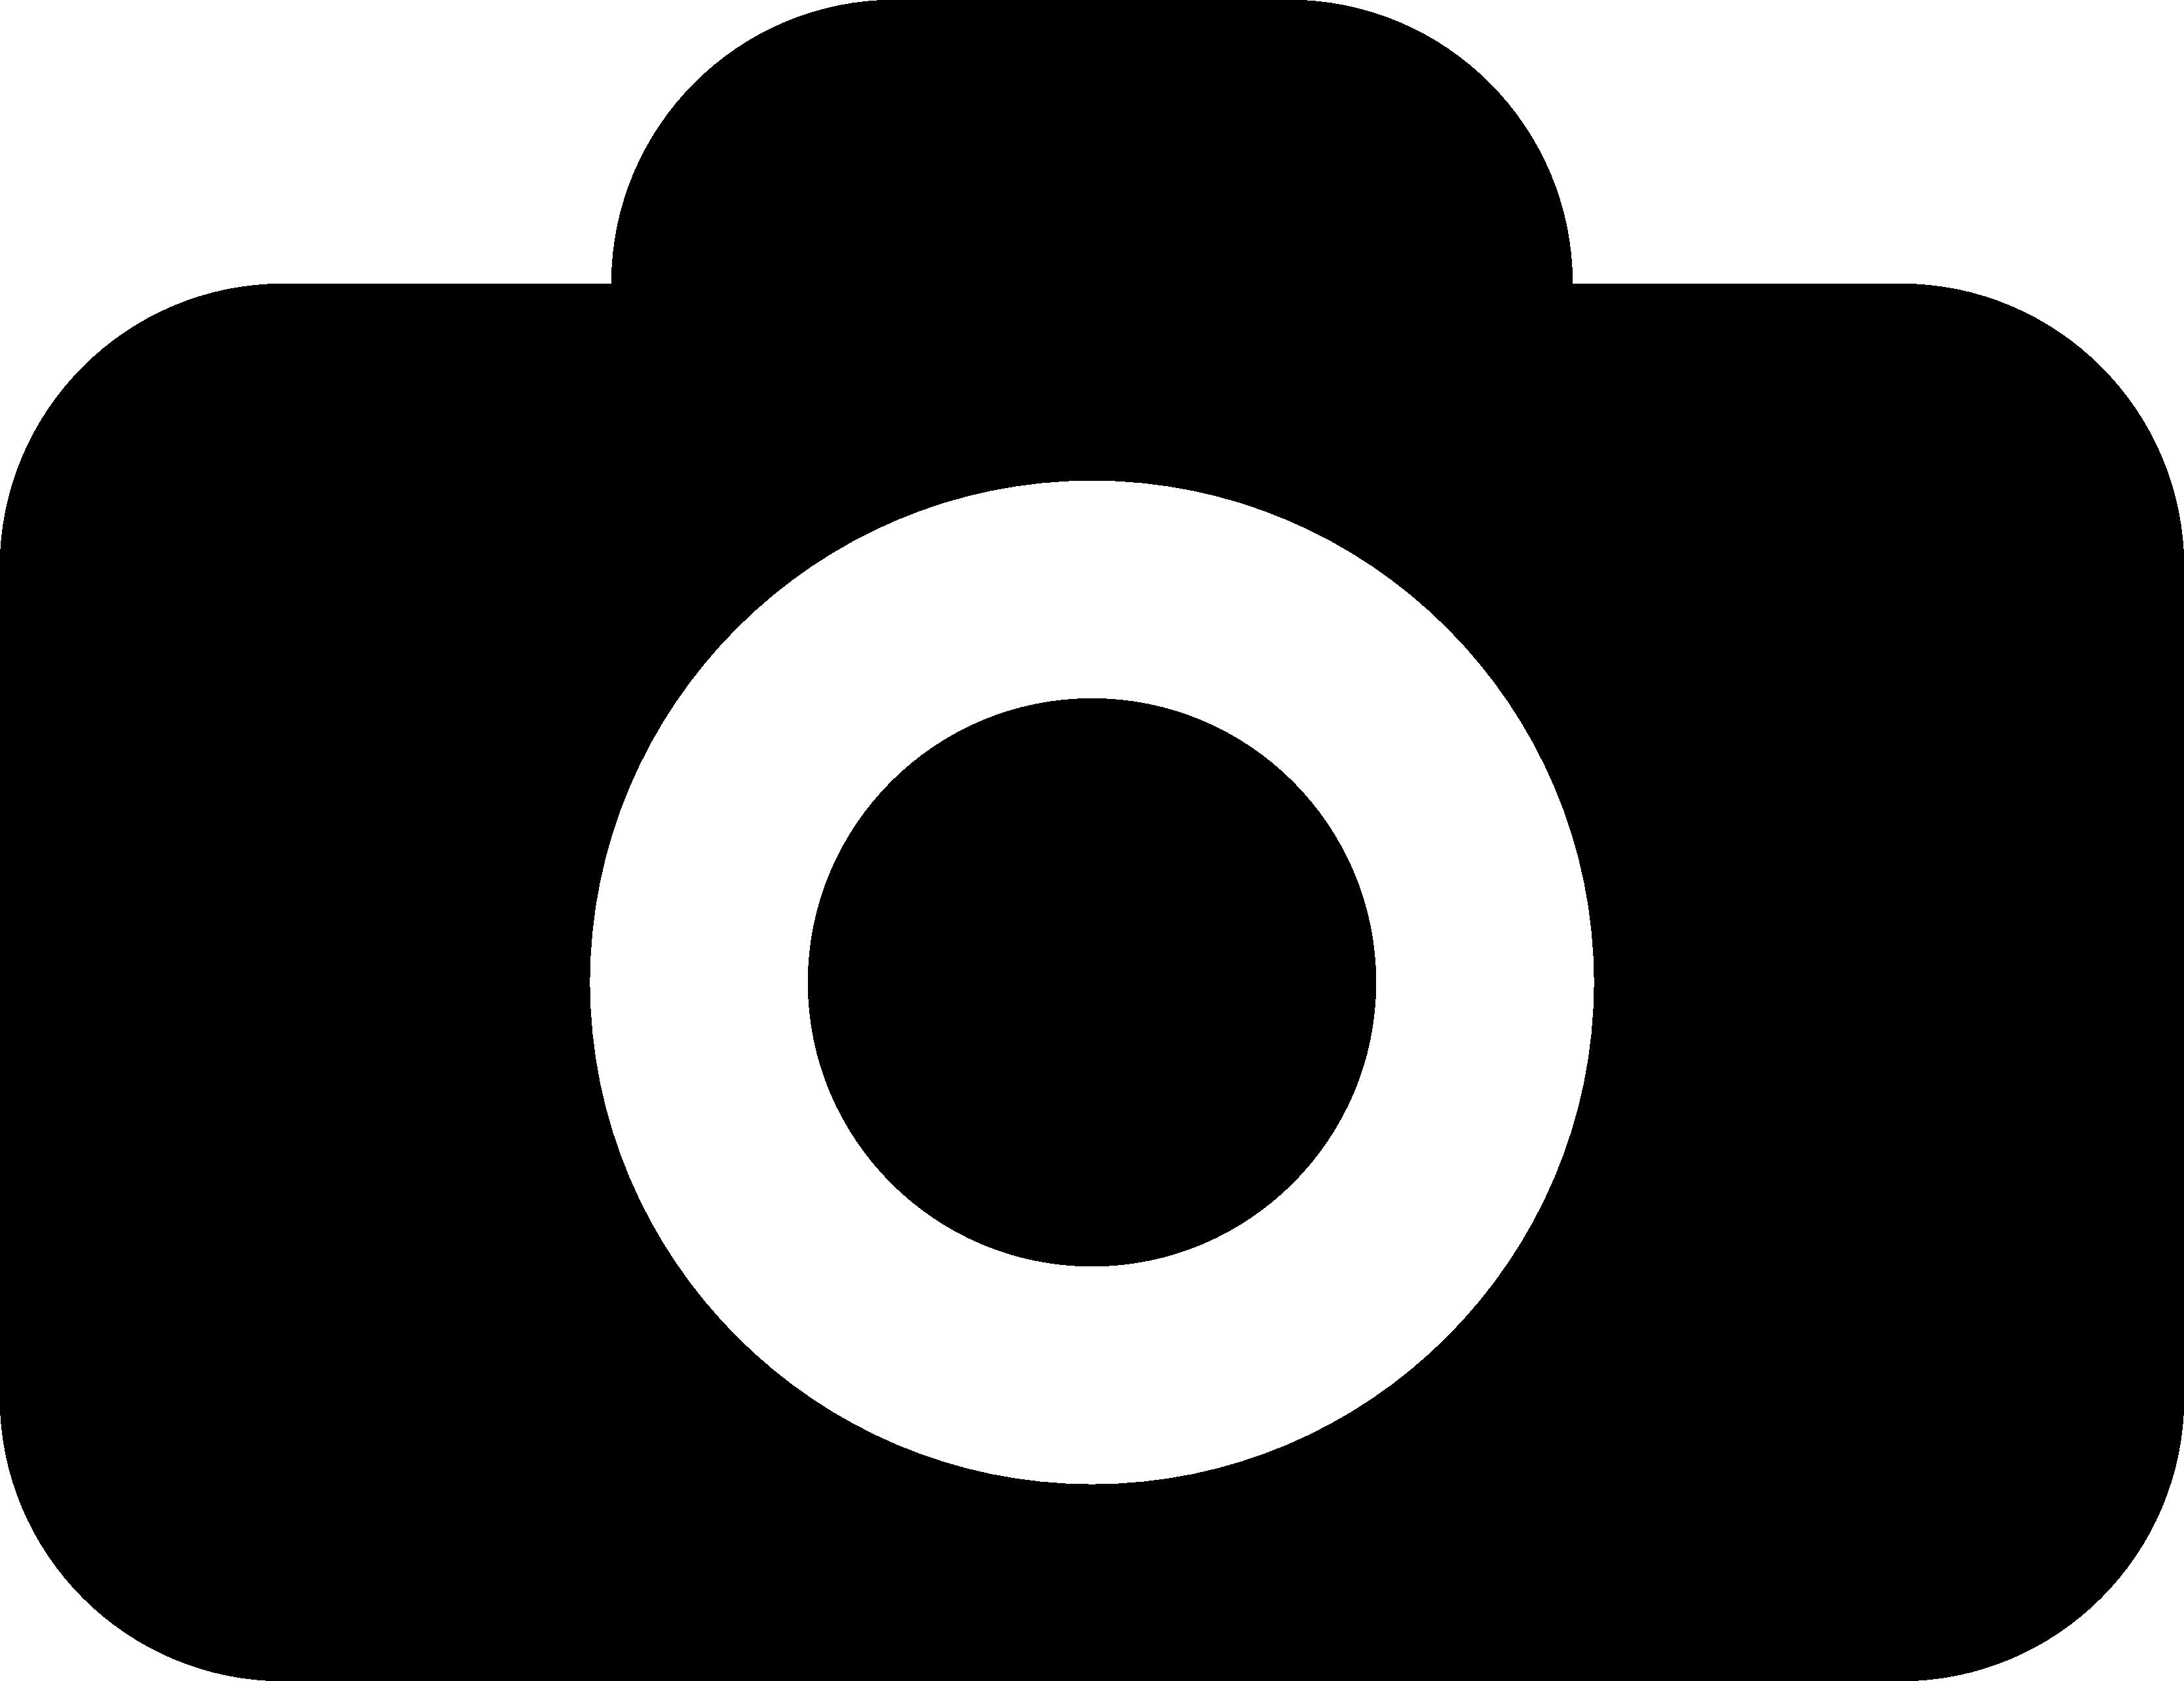 video camera logo clipart - photo #12